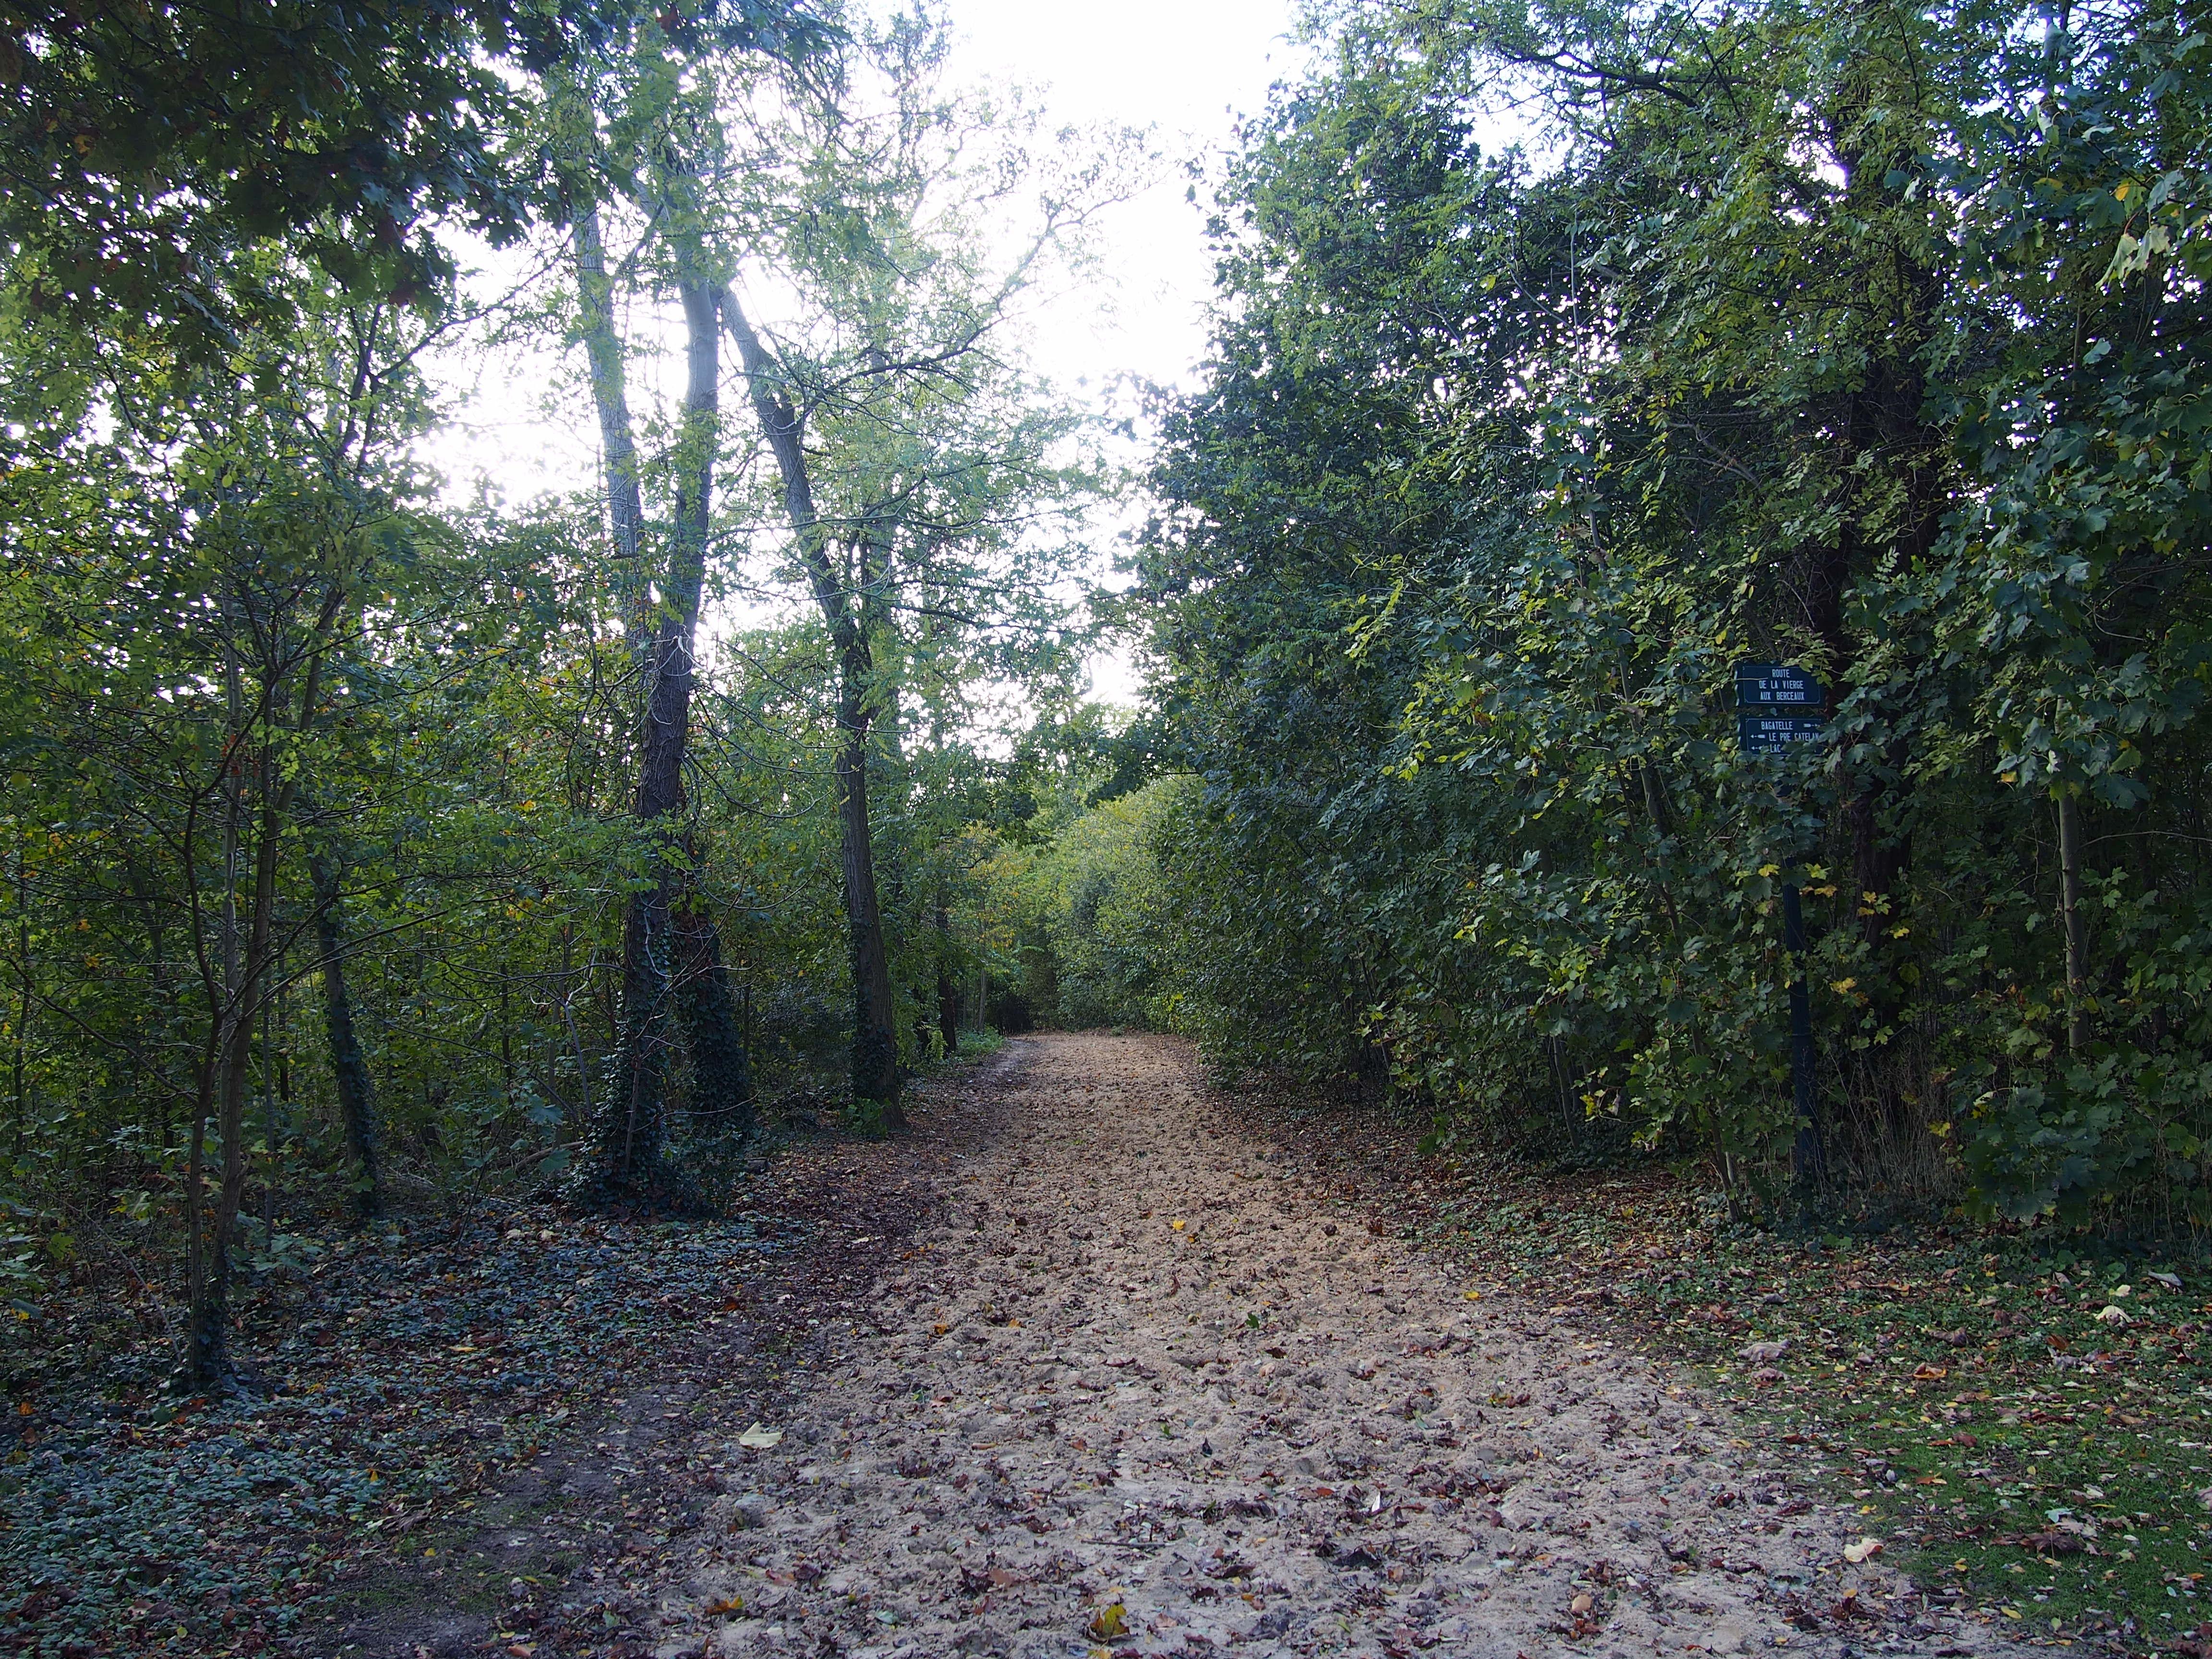 Location Velo Bois De Boulogne - Location Velo Bois De Boulogne u2013 Myqto com